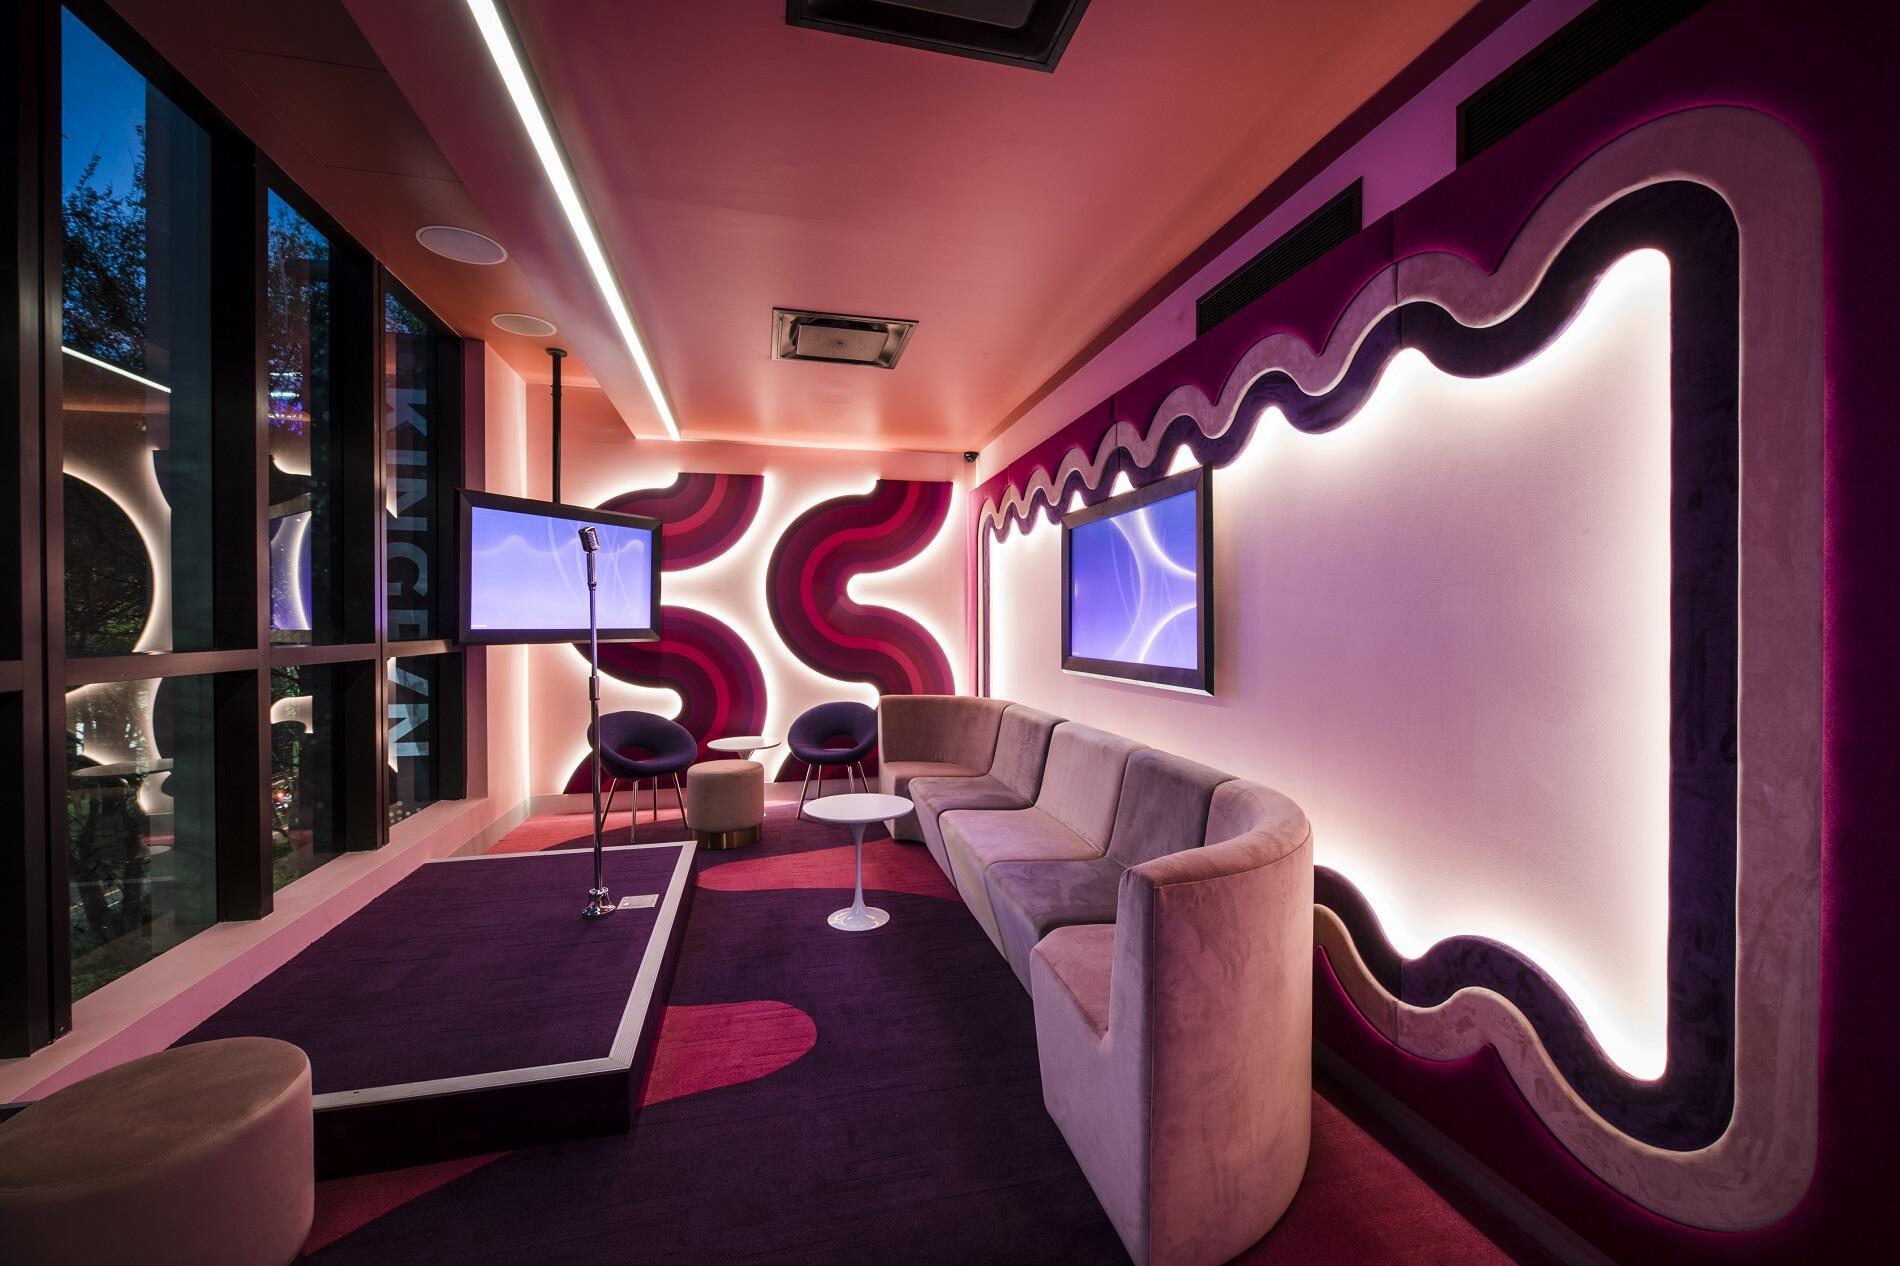 Juke's karaoke bar at Melbourne hotel